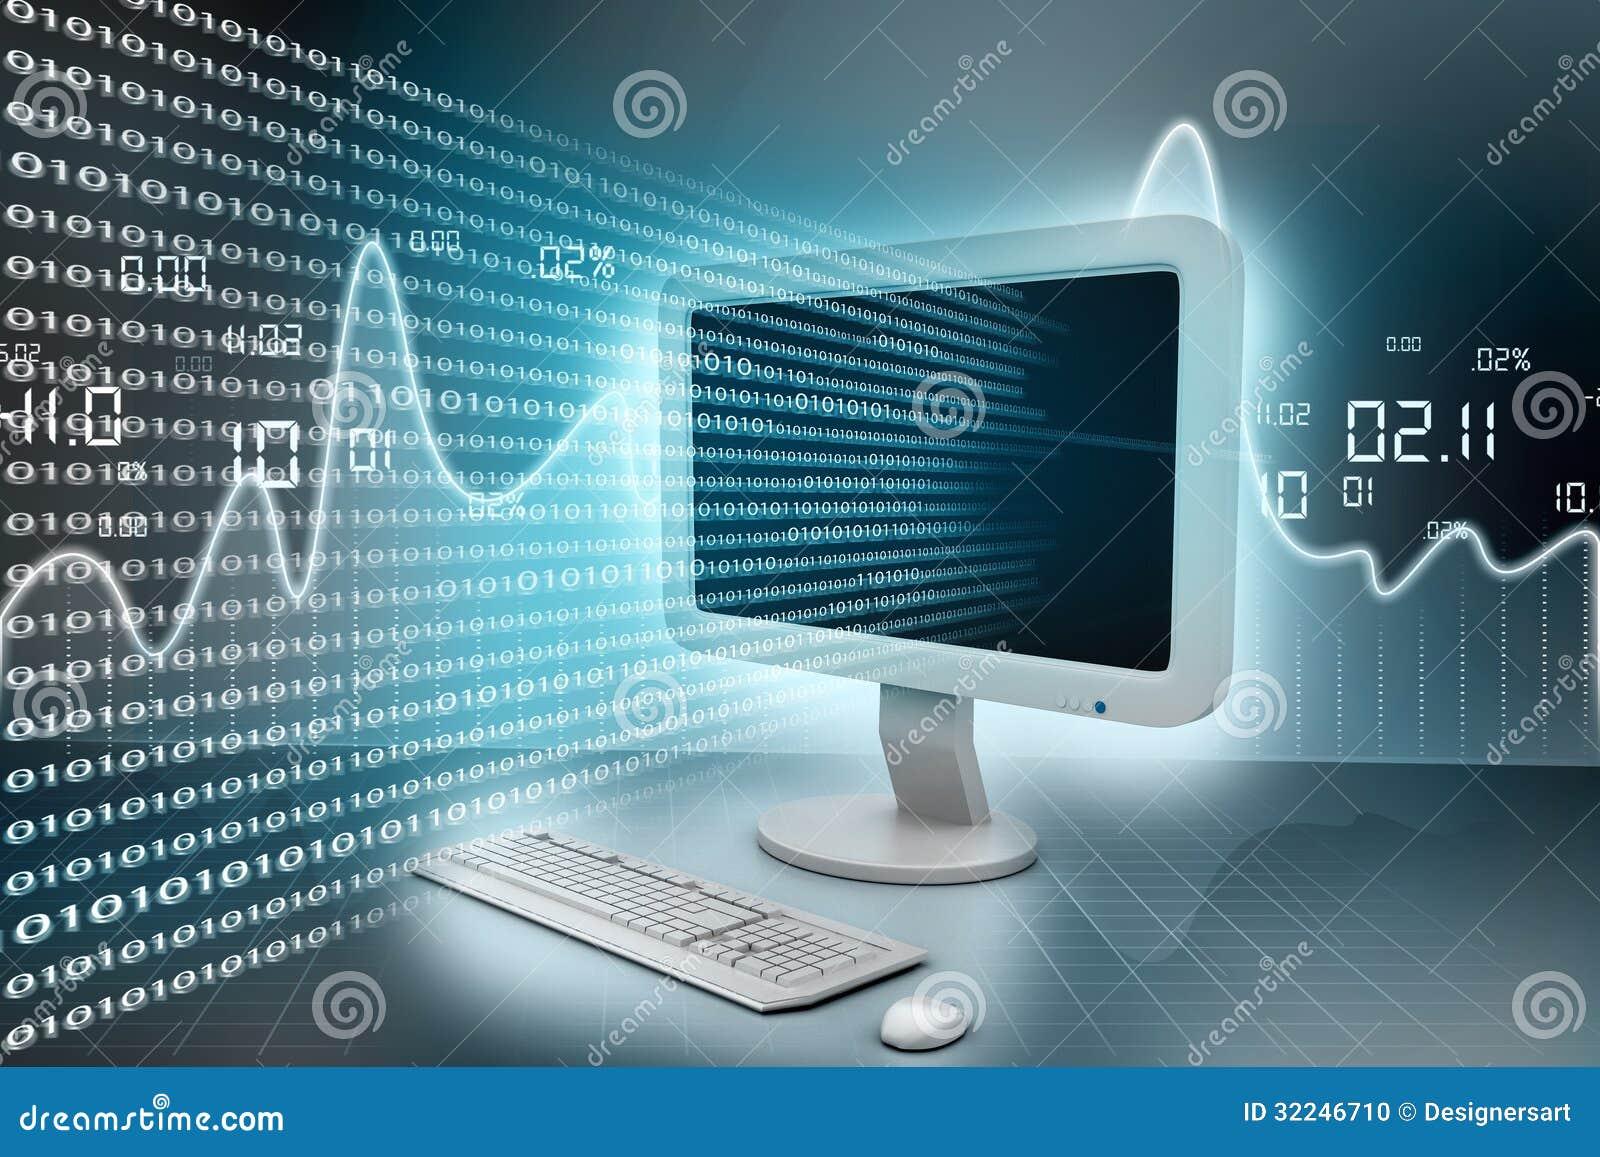 Modern Computer Technology Stock Photo Image 32246710